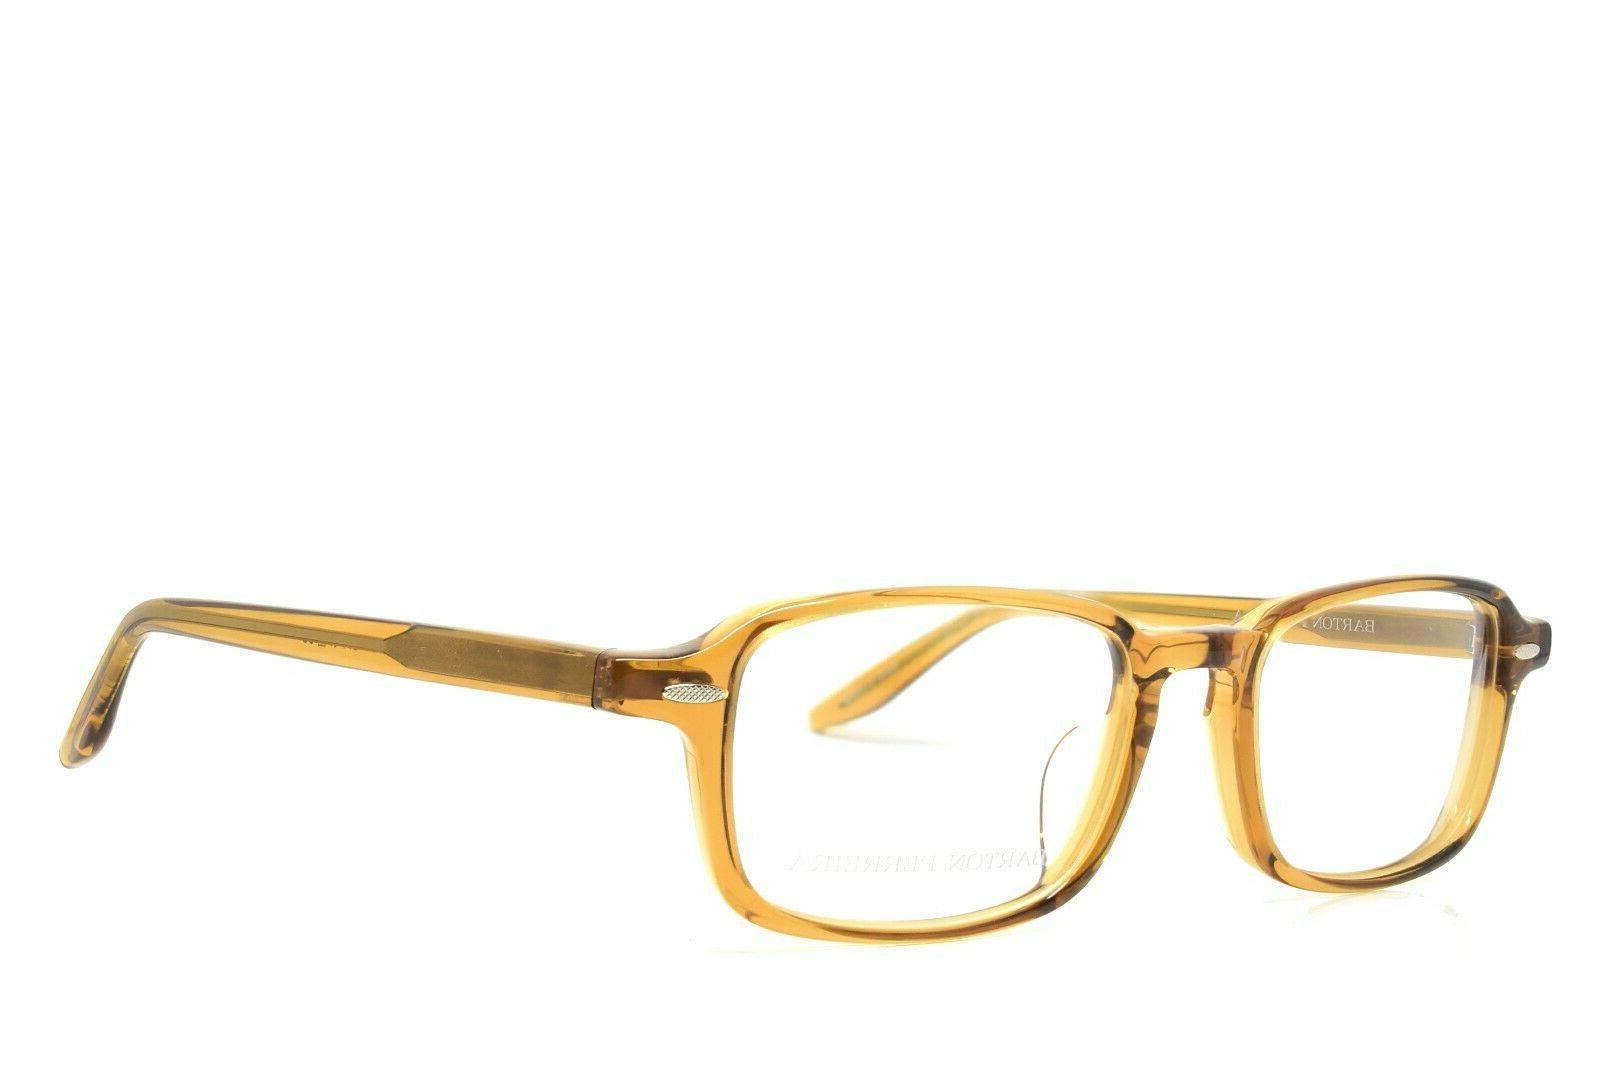 prescription eyeglasses asian fit ama jeston 50